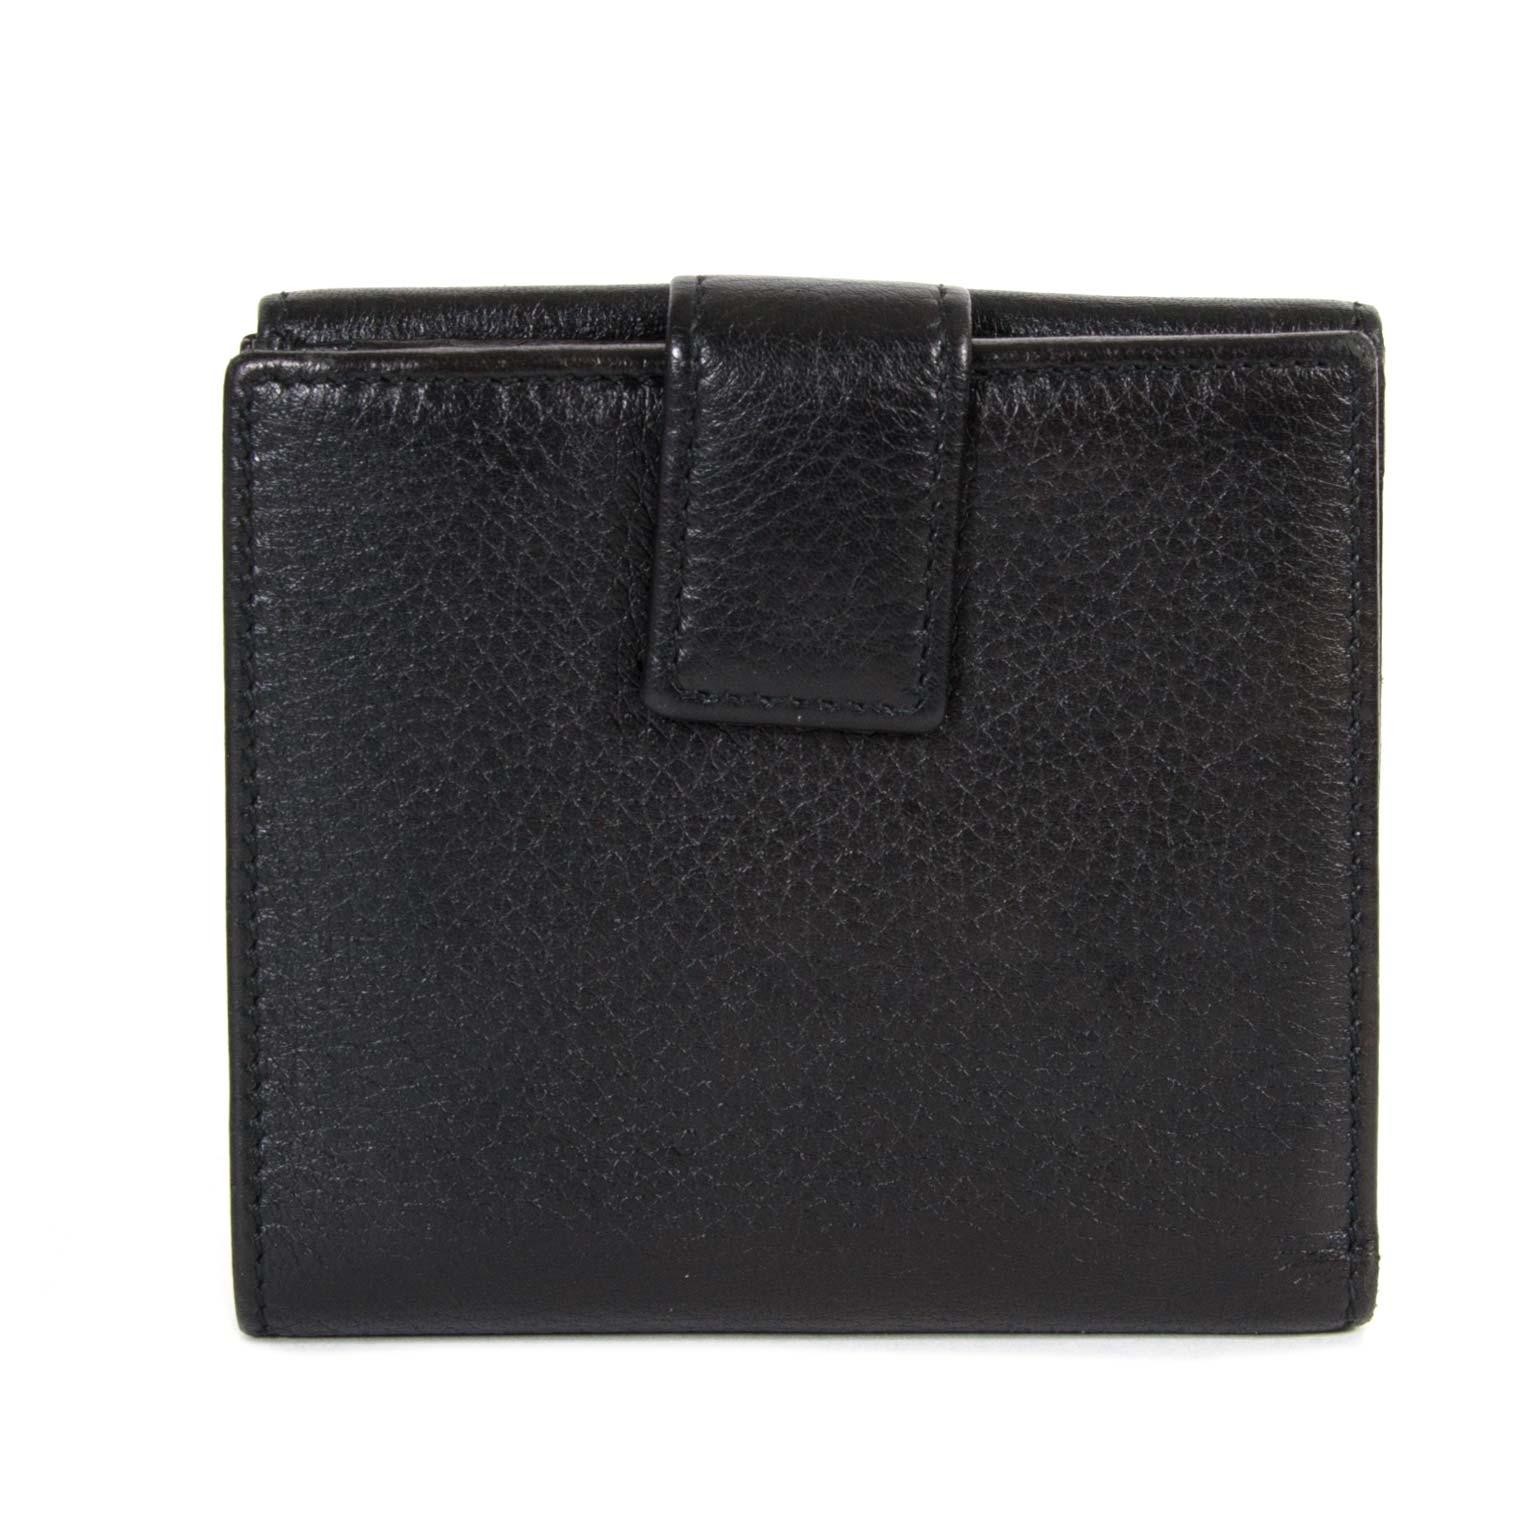 ac34c833ee76 ... koop Gucci Black Bamboo Bi-Fold Wallet en betaal veilig online